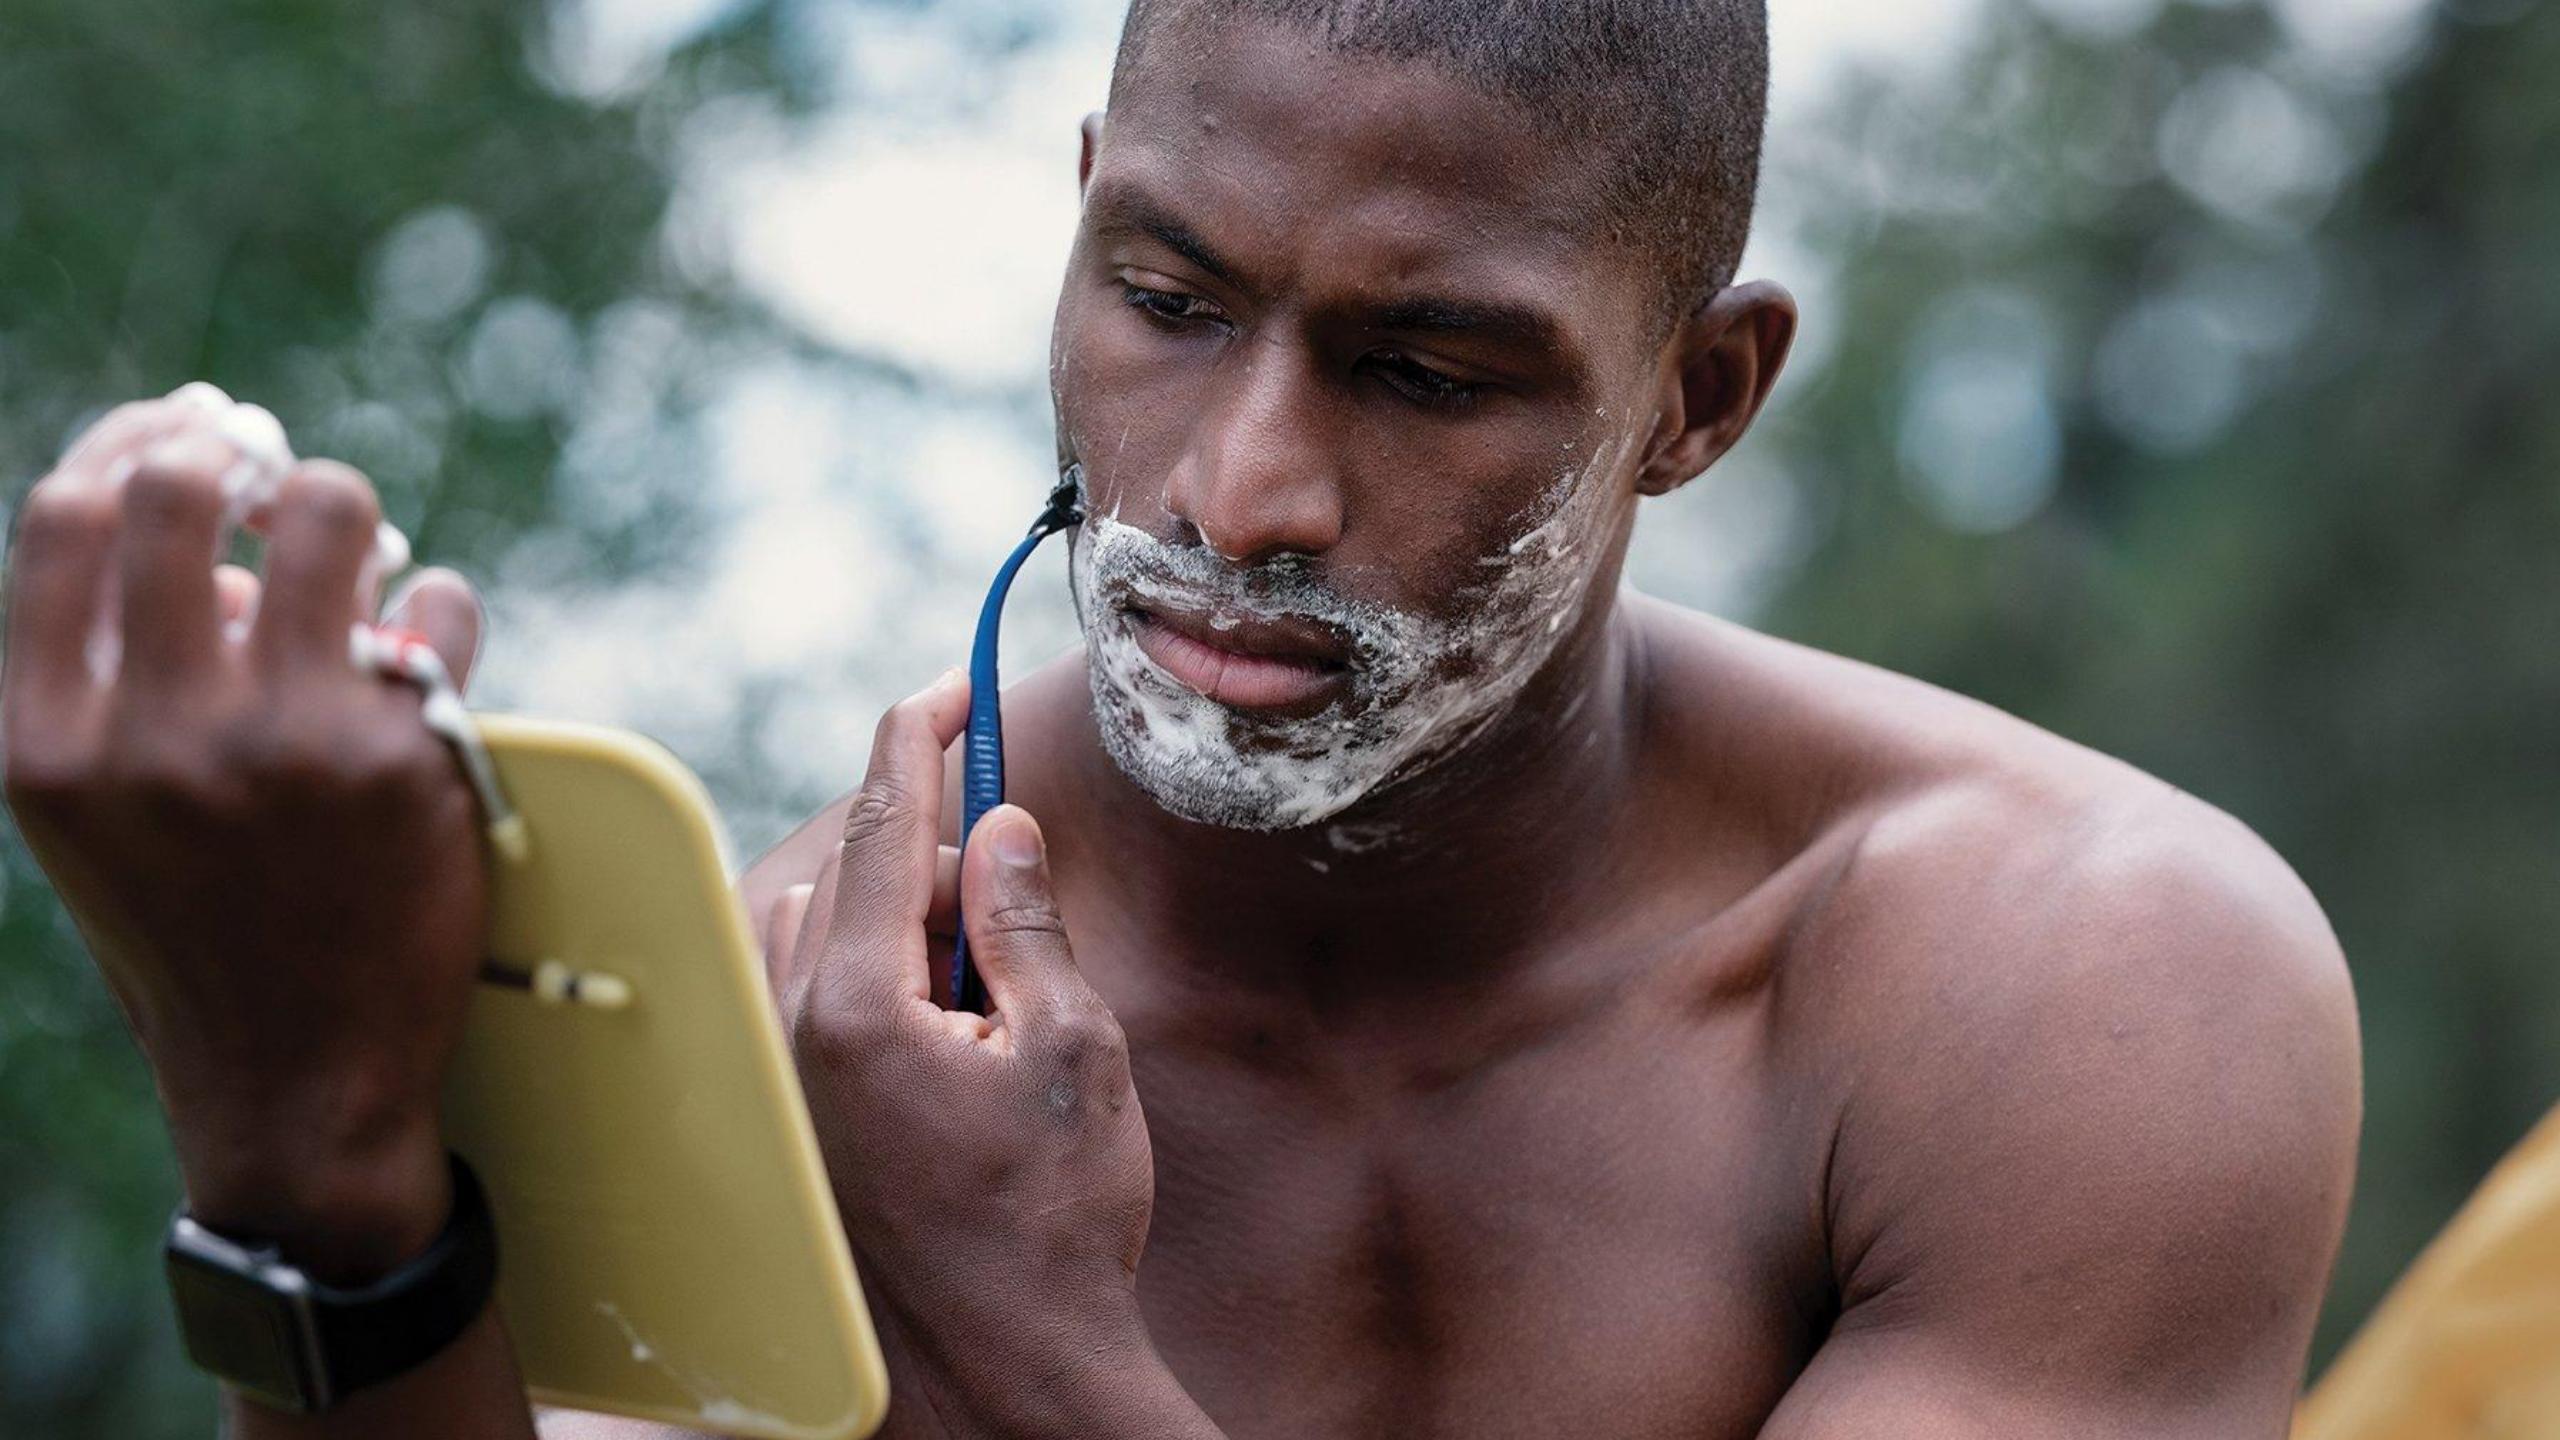 Newsweek Amplify - Top 10 Military Hygiene